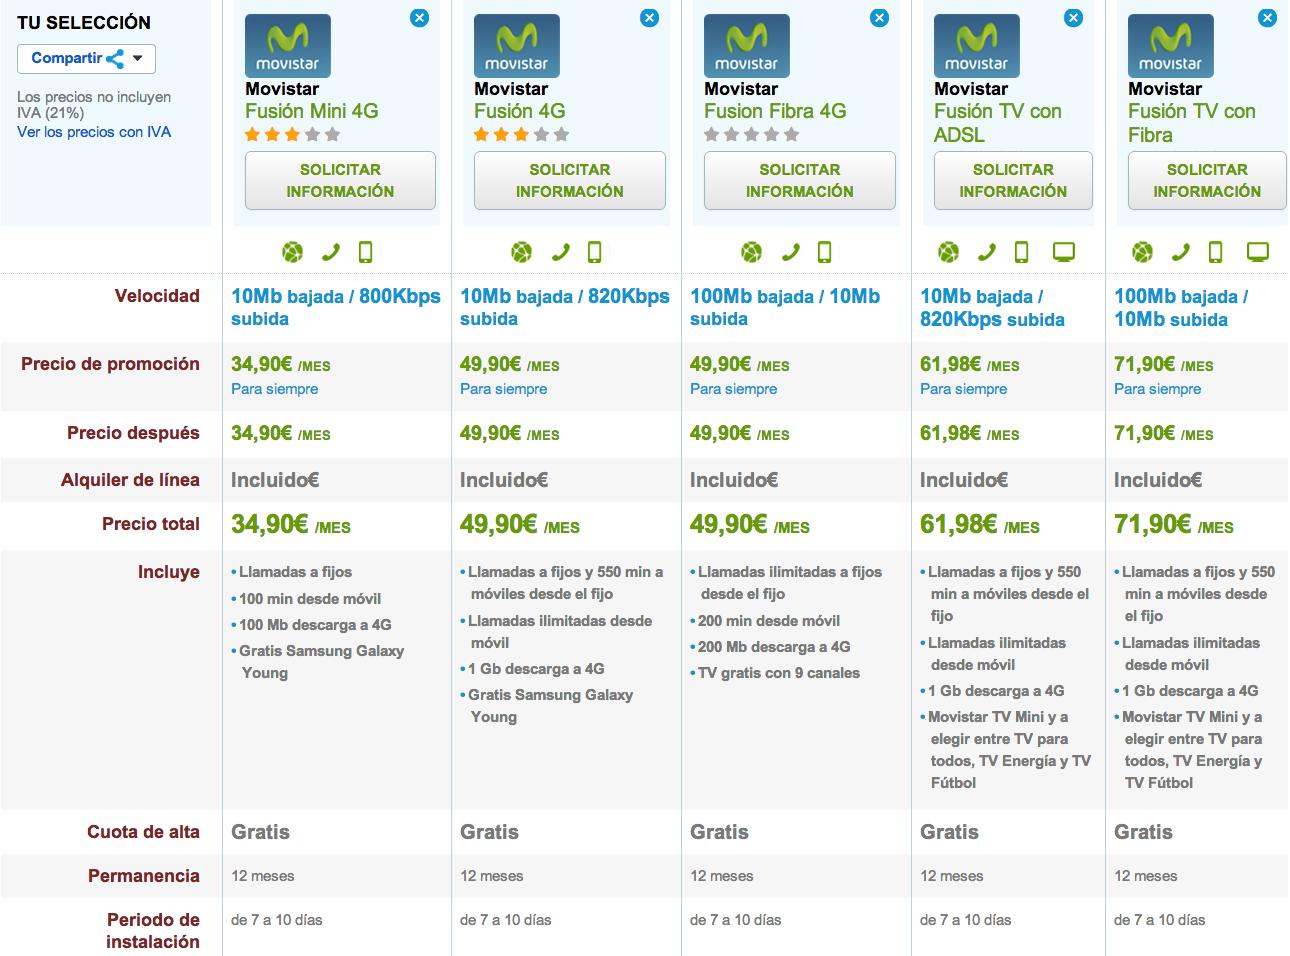 Comparativa tarifas Movistar